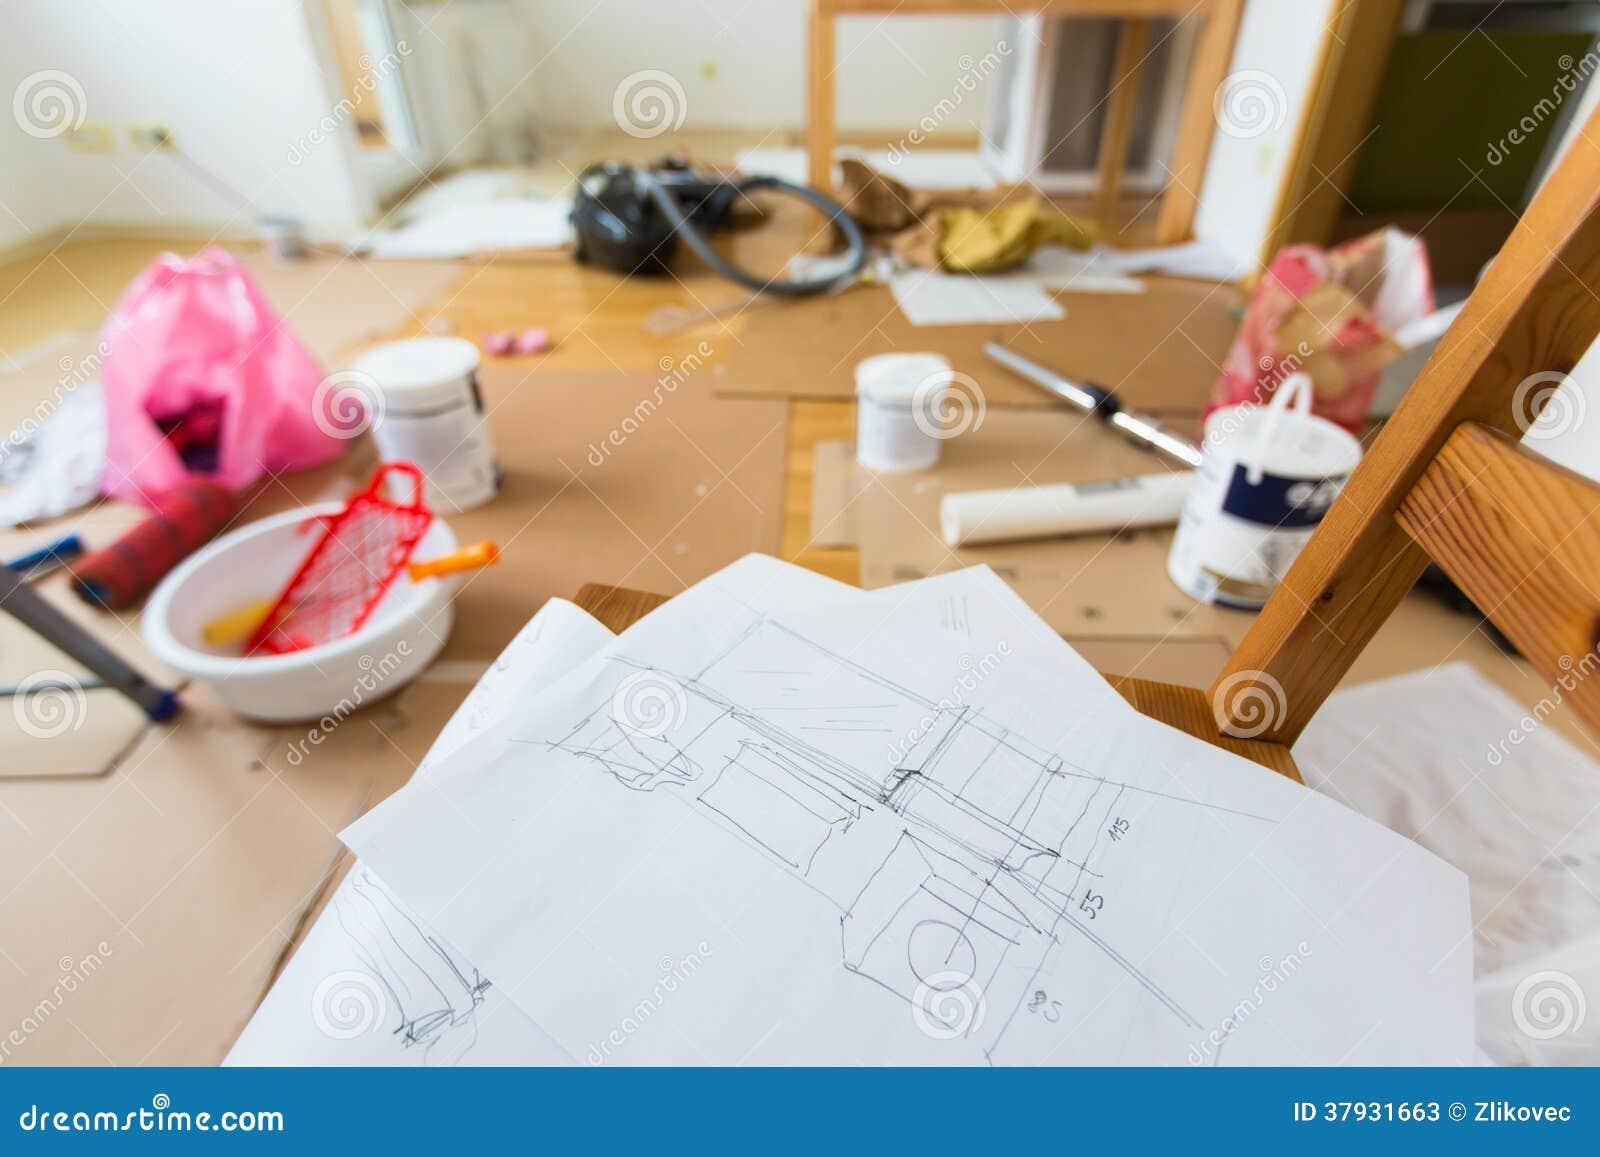 Чертеж домашней реновации